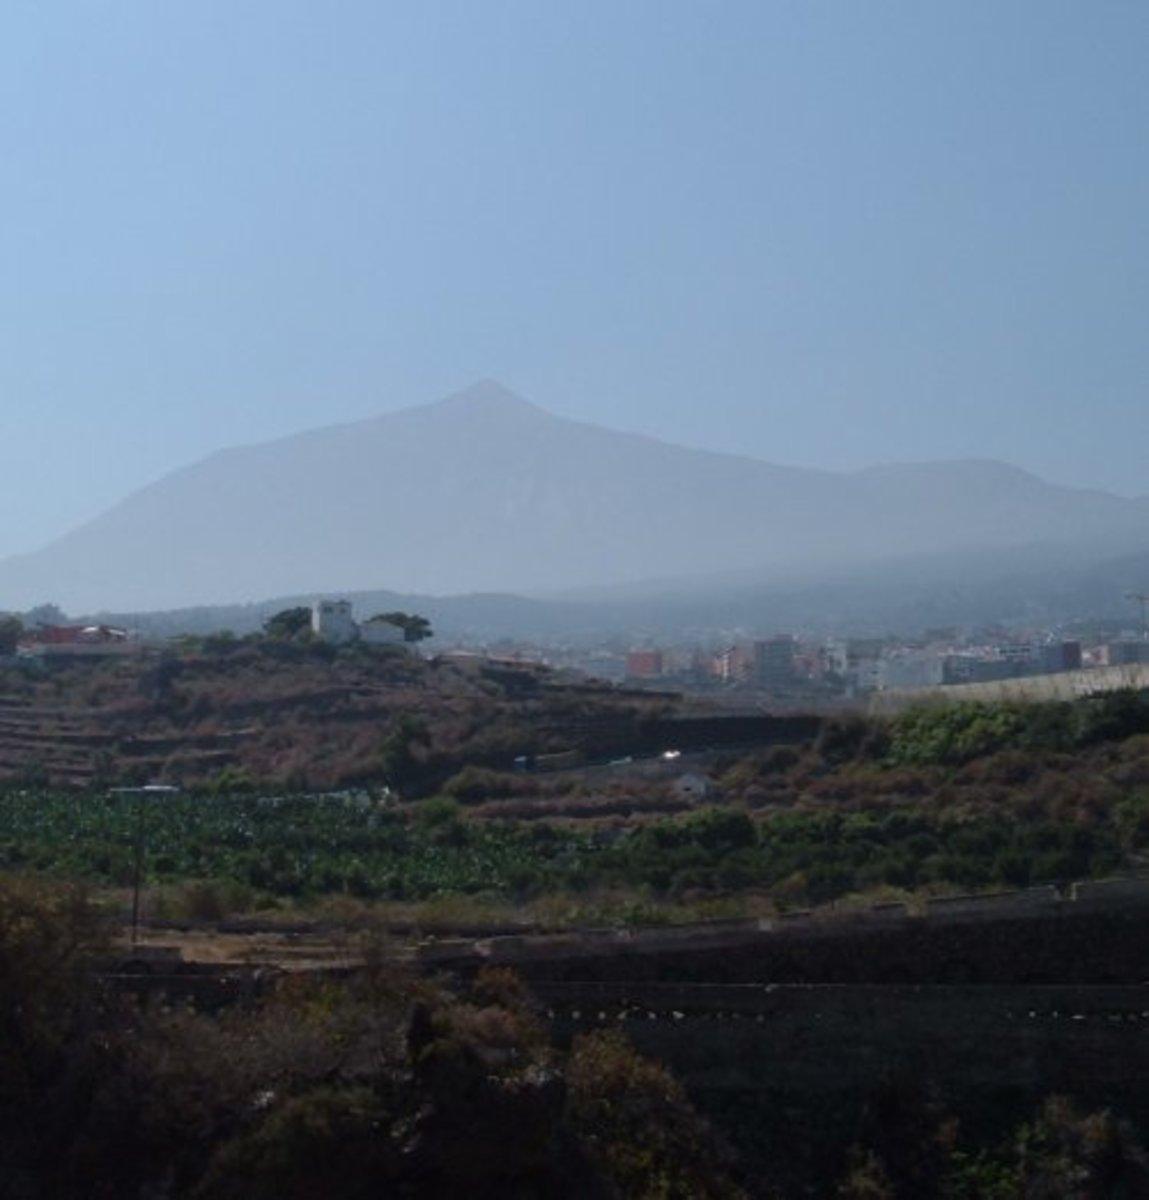 Mount Teide and Pico Viejo seen through a calima